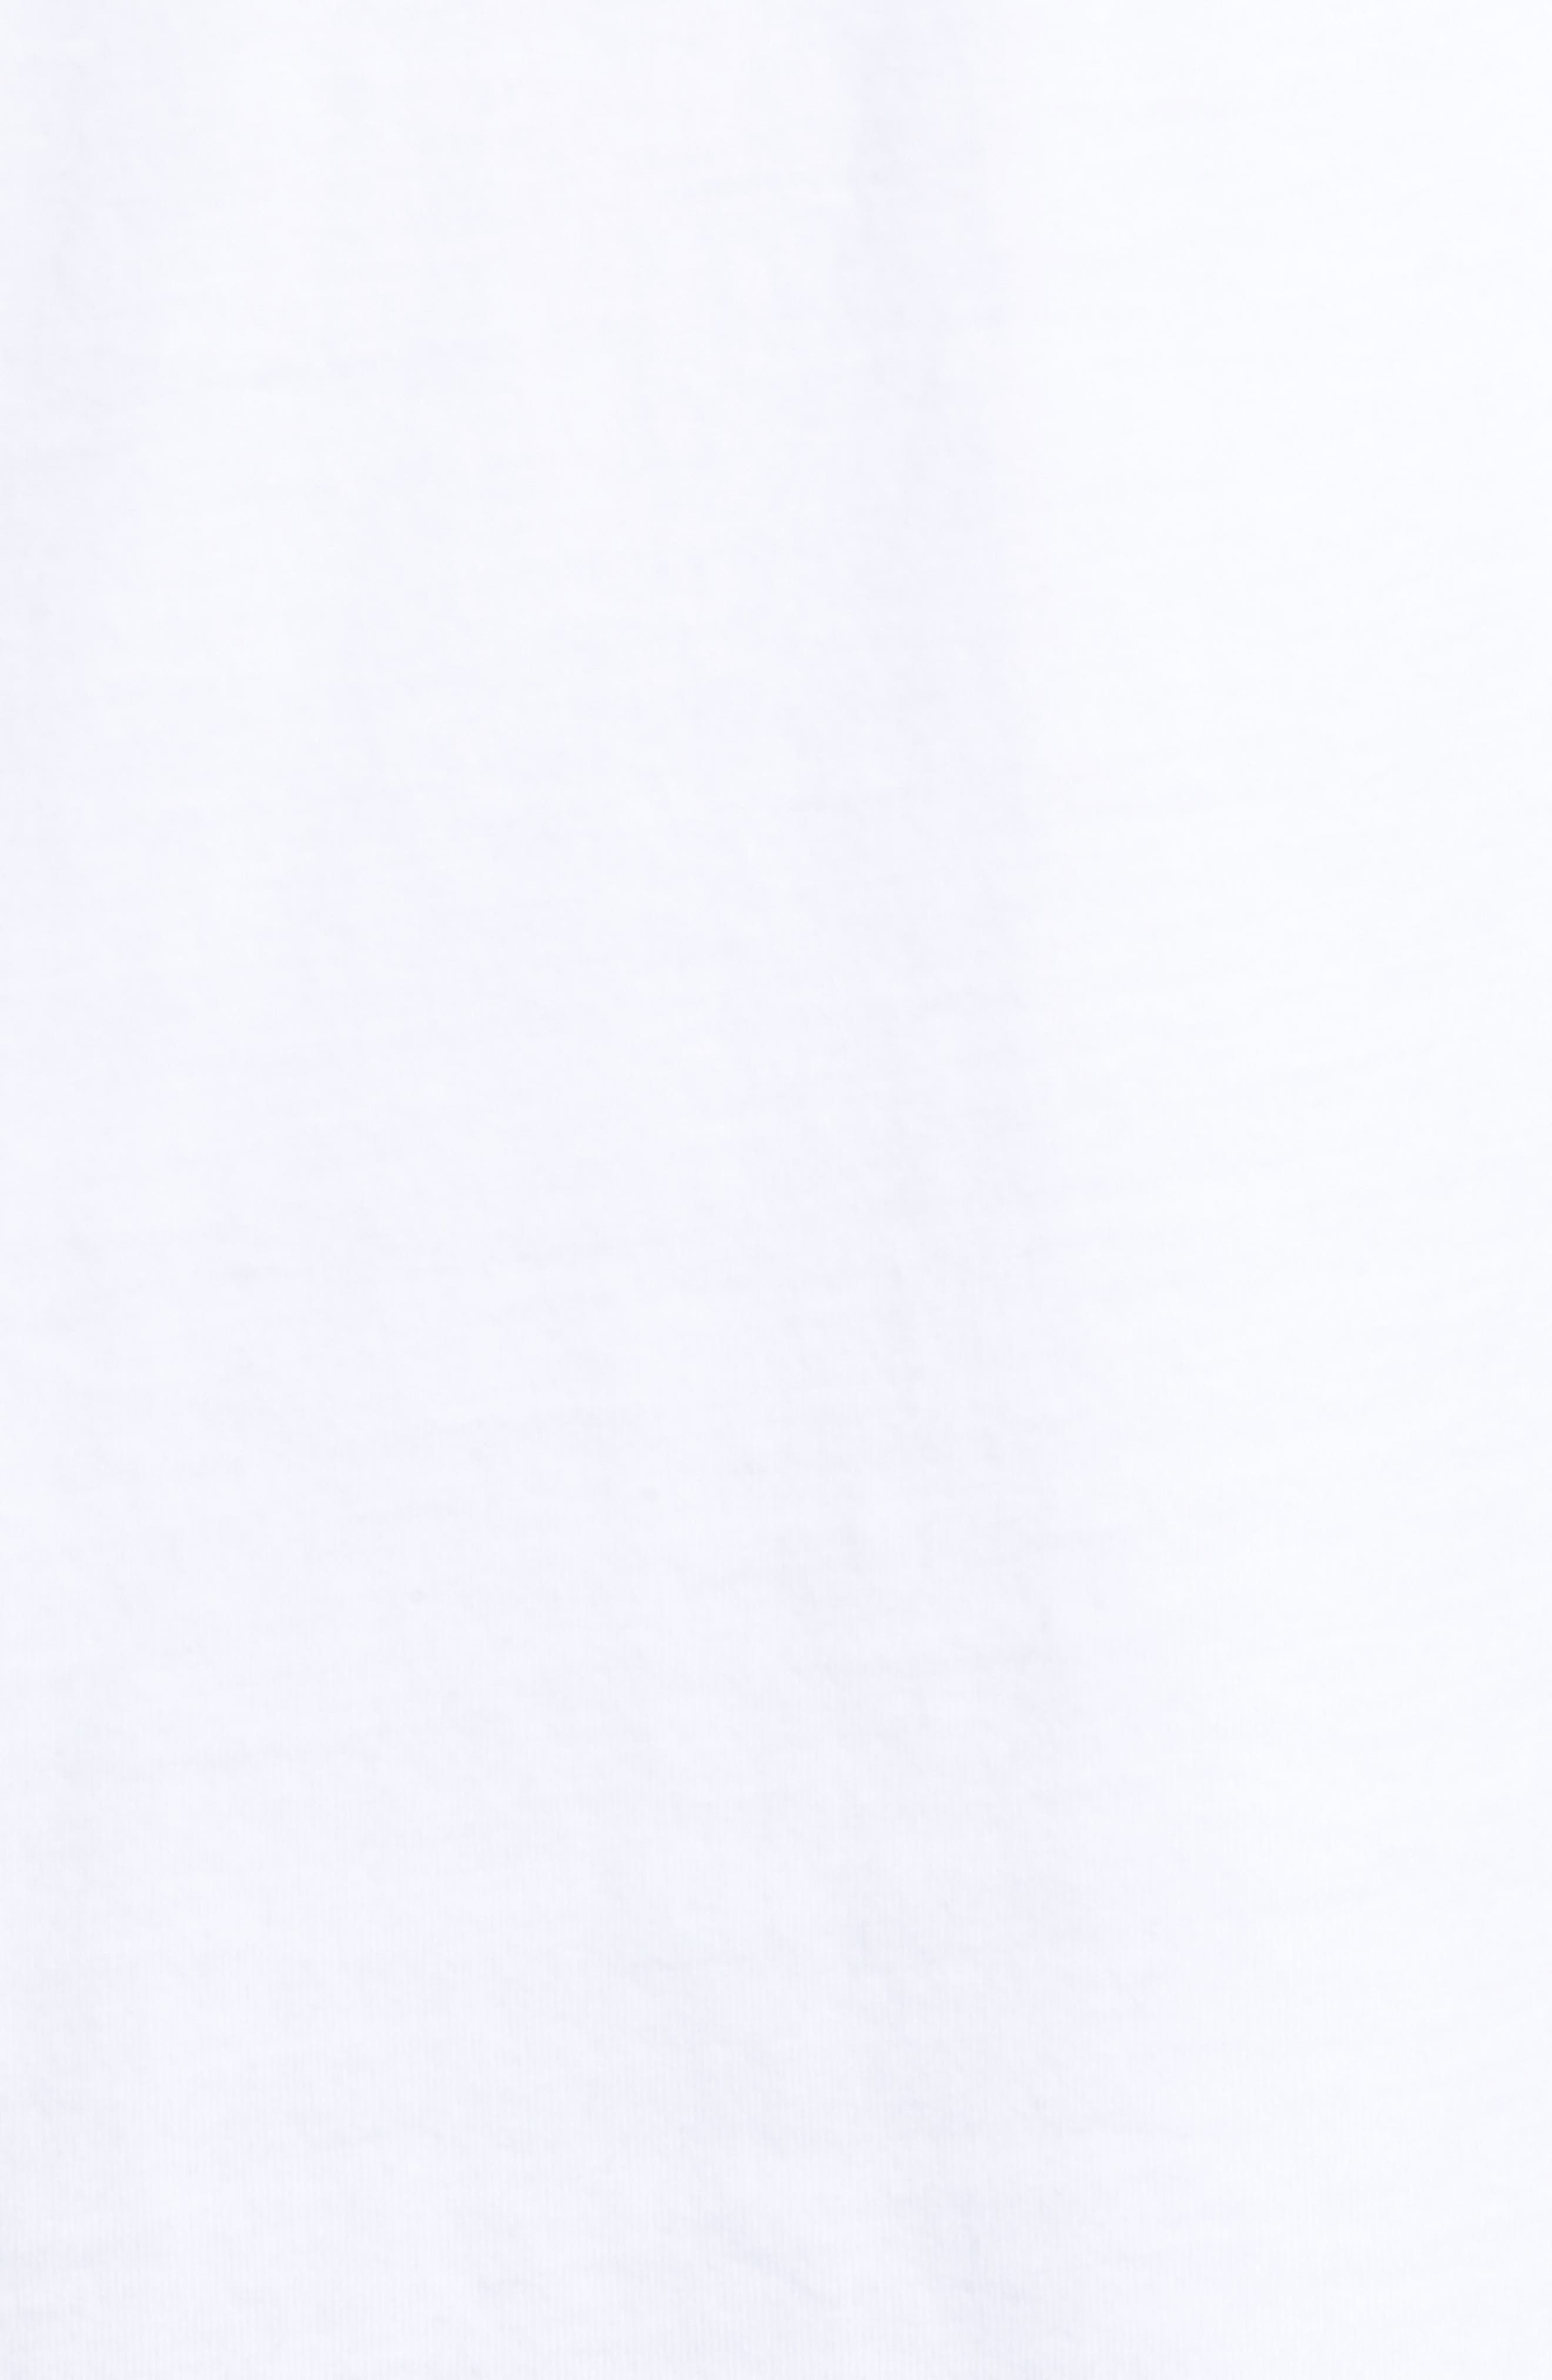 Spinnaker Sail Long Sleeve Pocket T-Shirt,                             Alternate thumbnail 5, color,                             White Cap